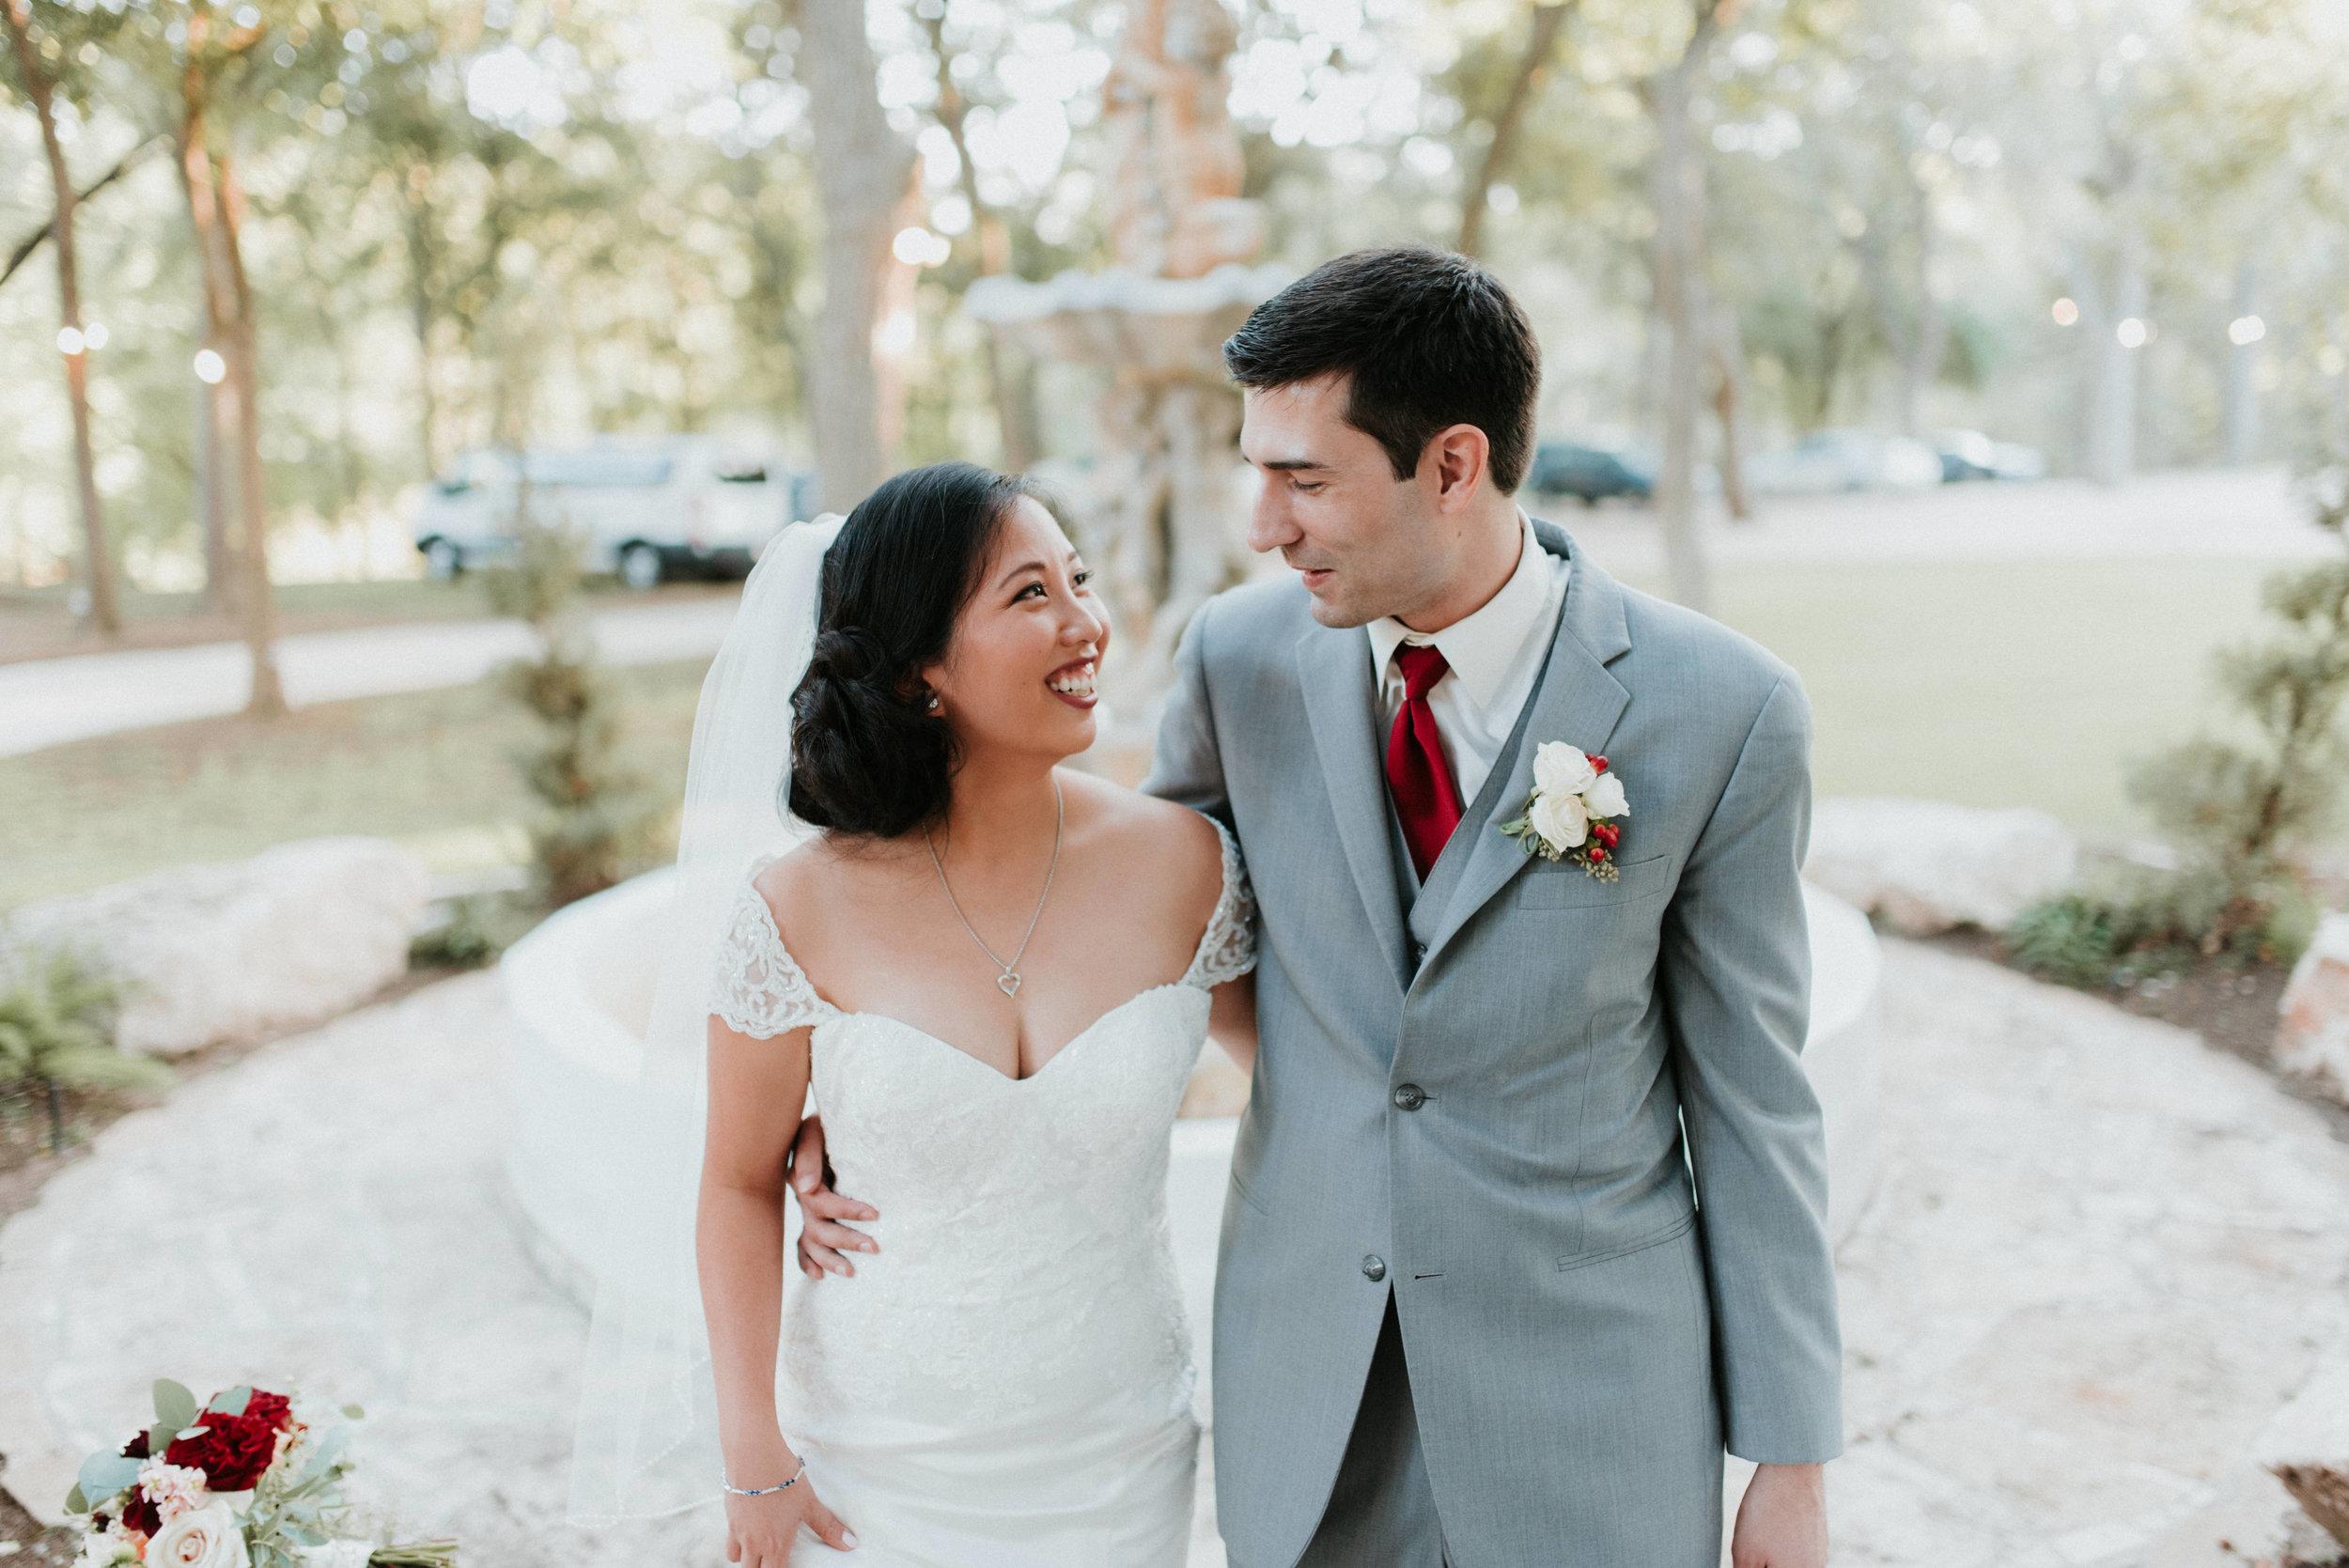 Mr. & Mrs. LeBranche - 158.jpg